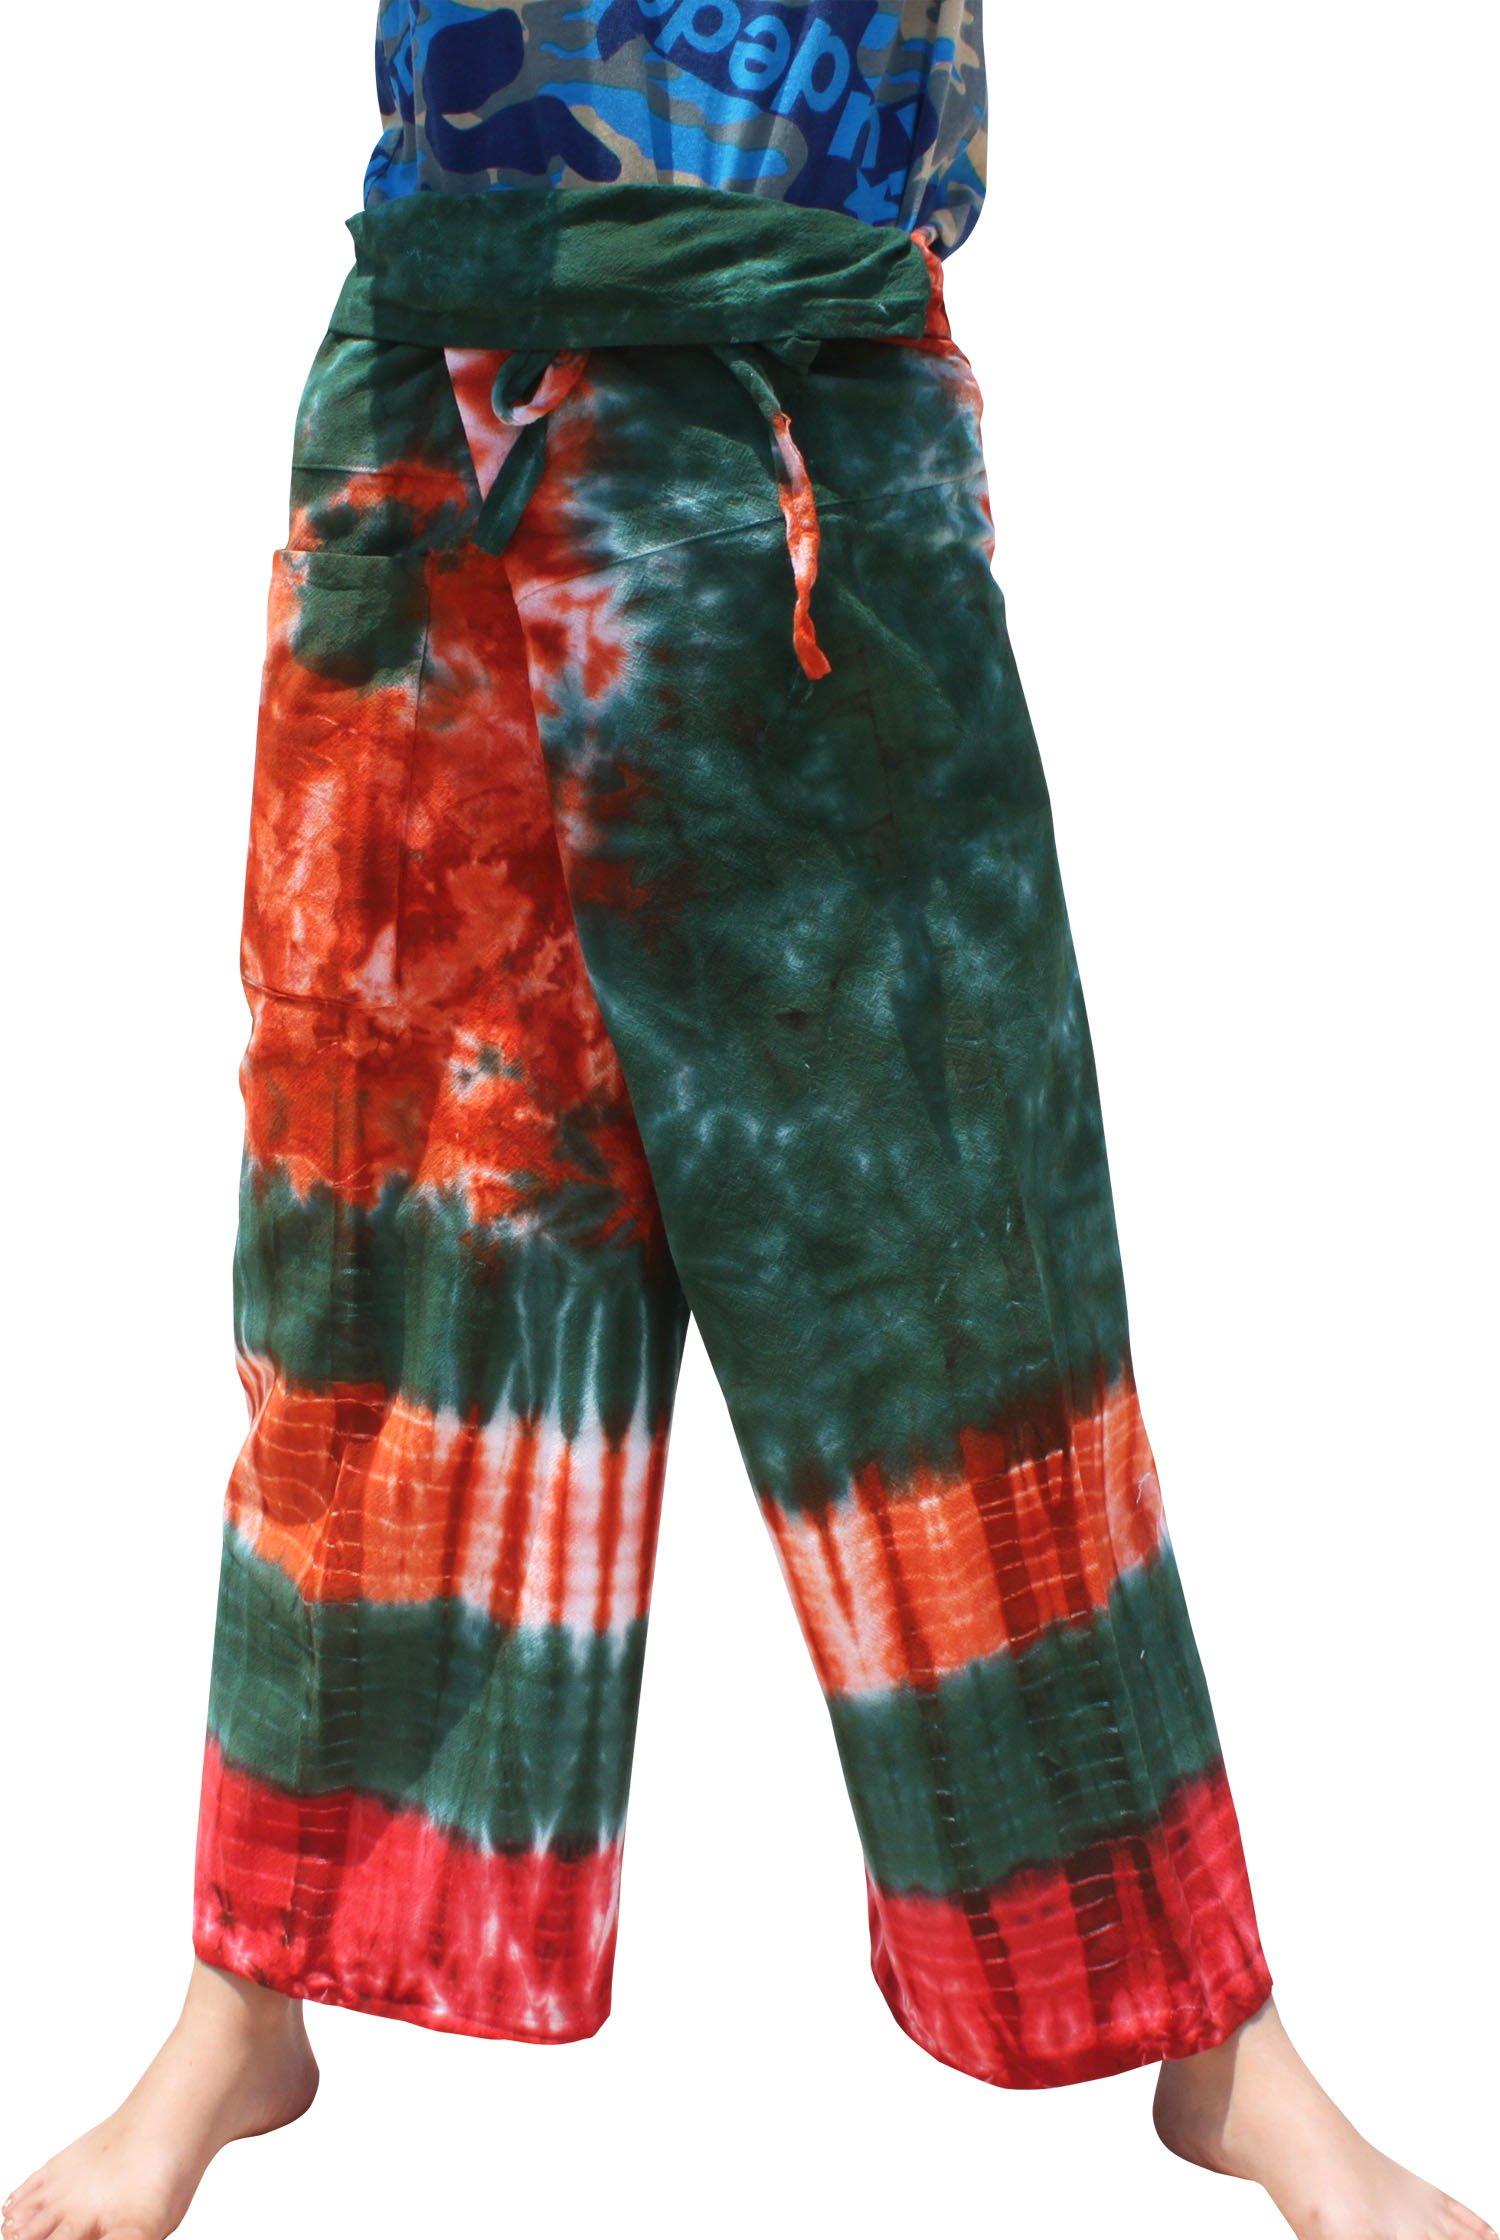 Raan Pah Muang Thick Muang Cotton Thai Fishermans Pants Vibrant TieDyed Tie Dye, Small, Green Orange by Raan Pah Muang